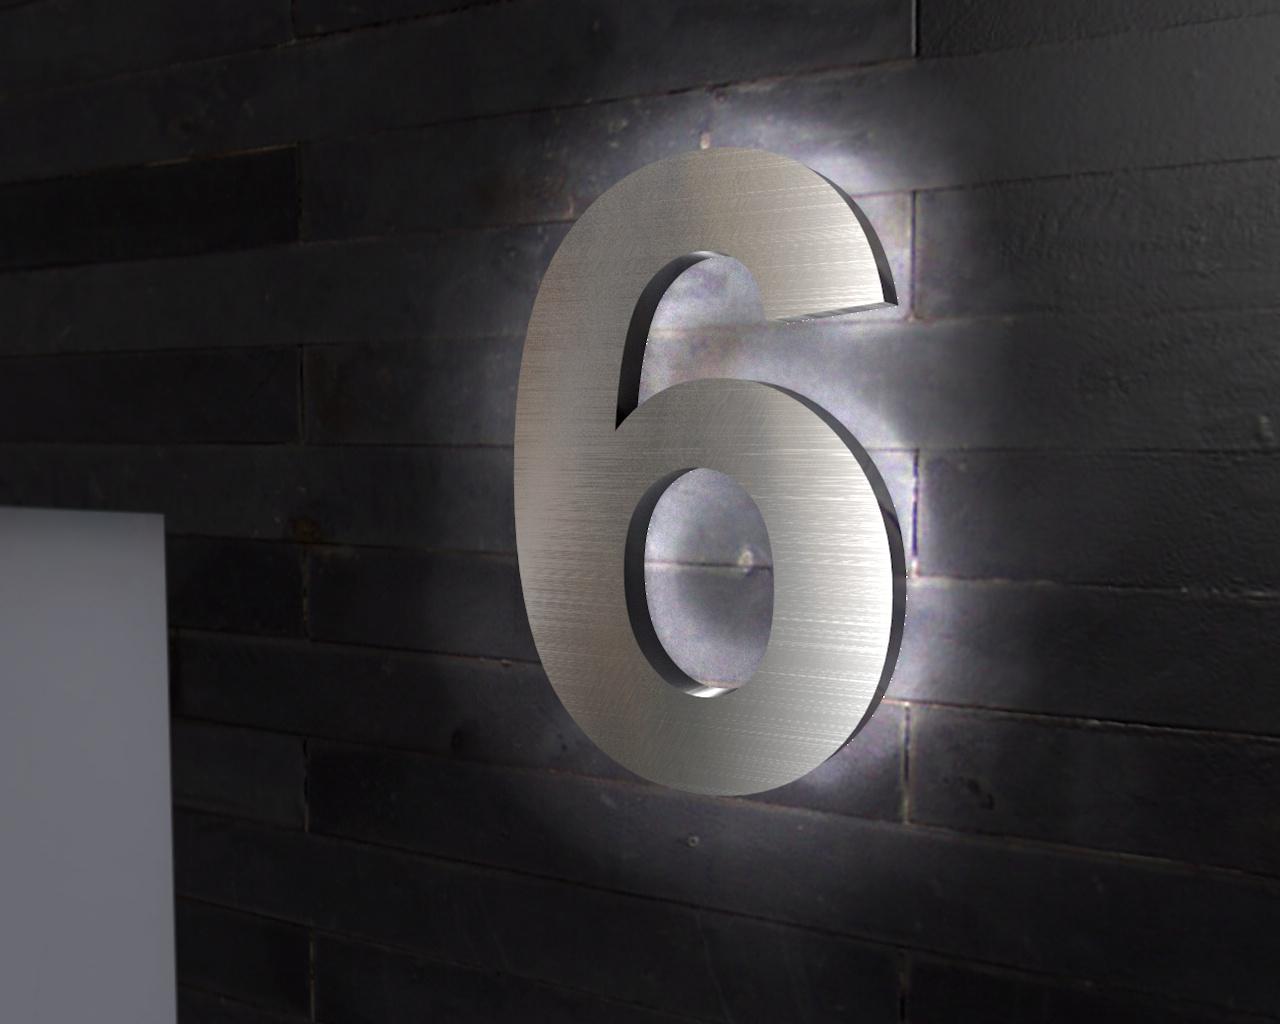 beleuchtete hausnummer mit d mmerungsschalter edelstahl. Black Bedroom Furniture Sets. Home Design Ideas